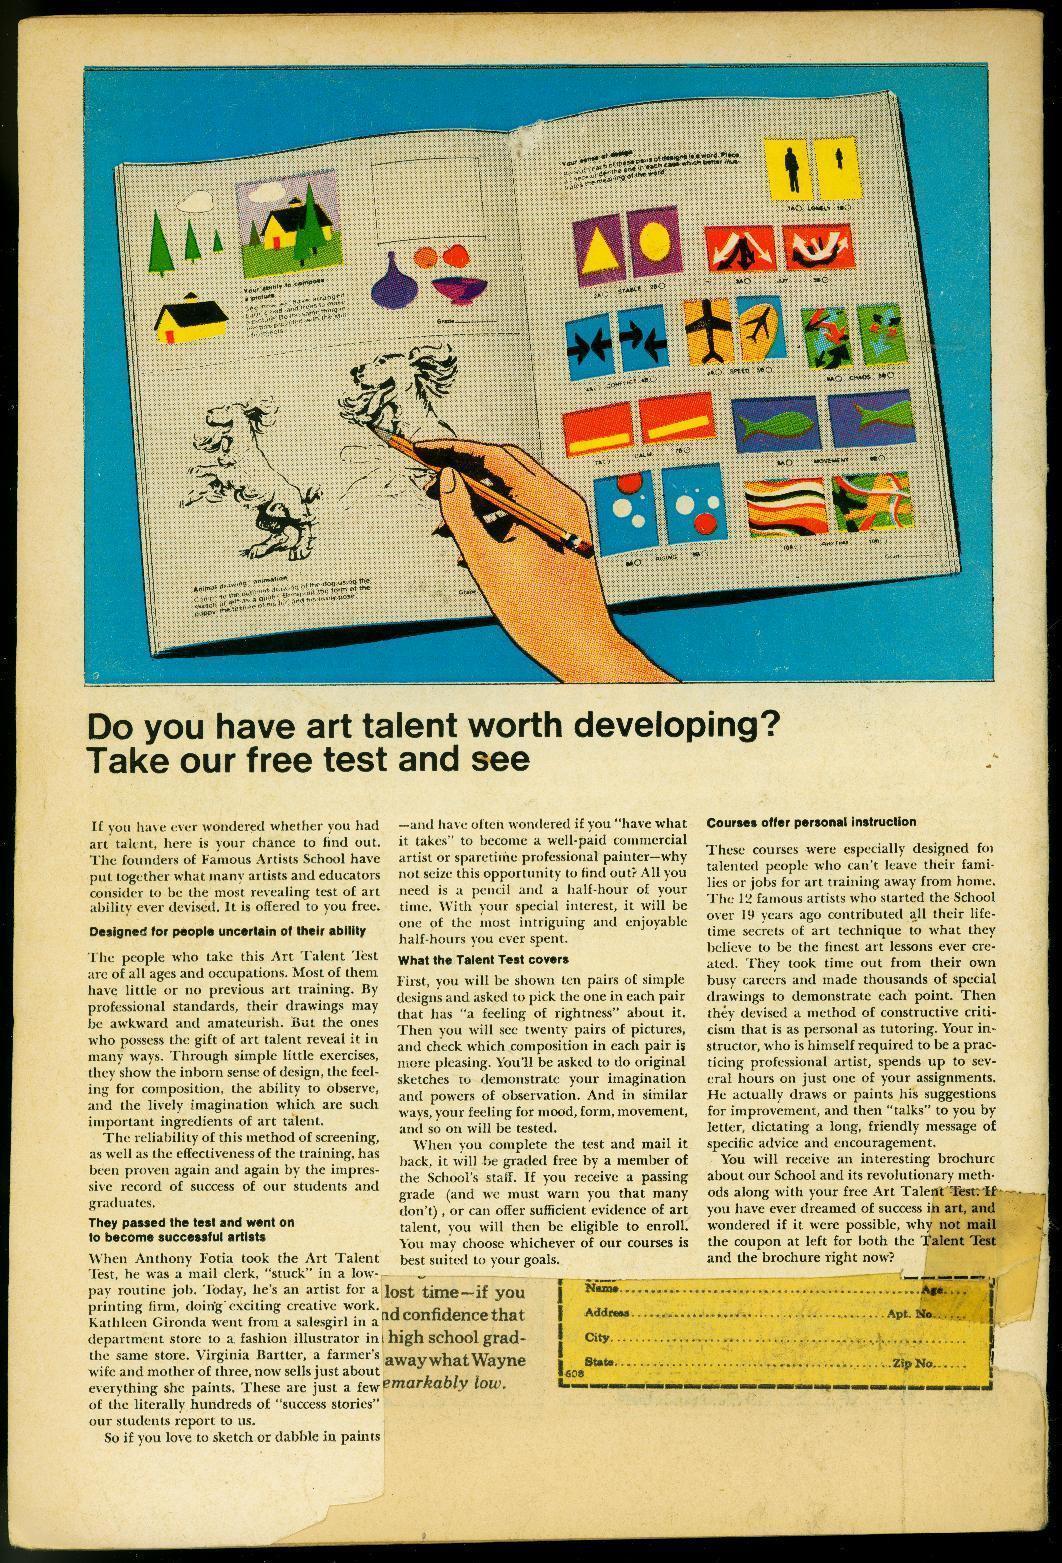 HOMER THE HAPPY GHOST #3 1970 MARVEL DAN DECARLO ART G- image 2